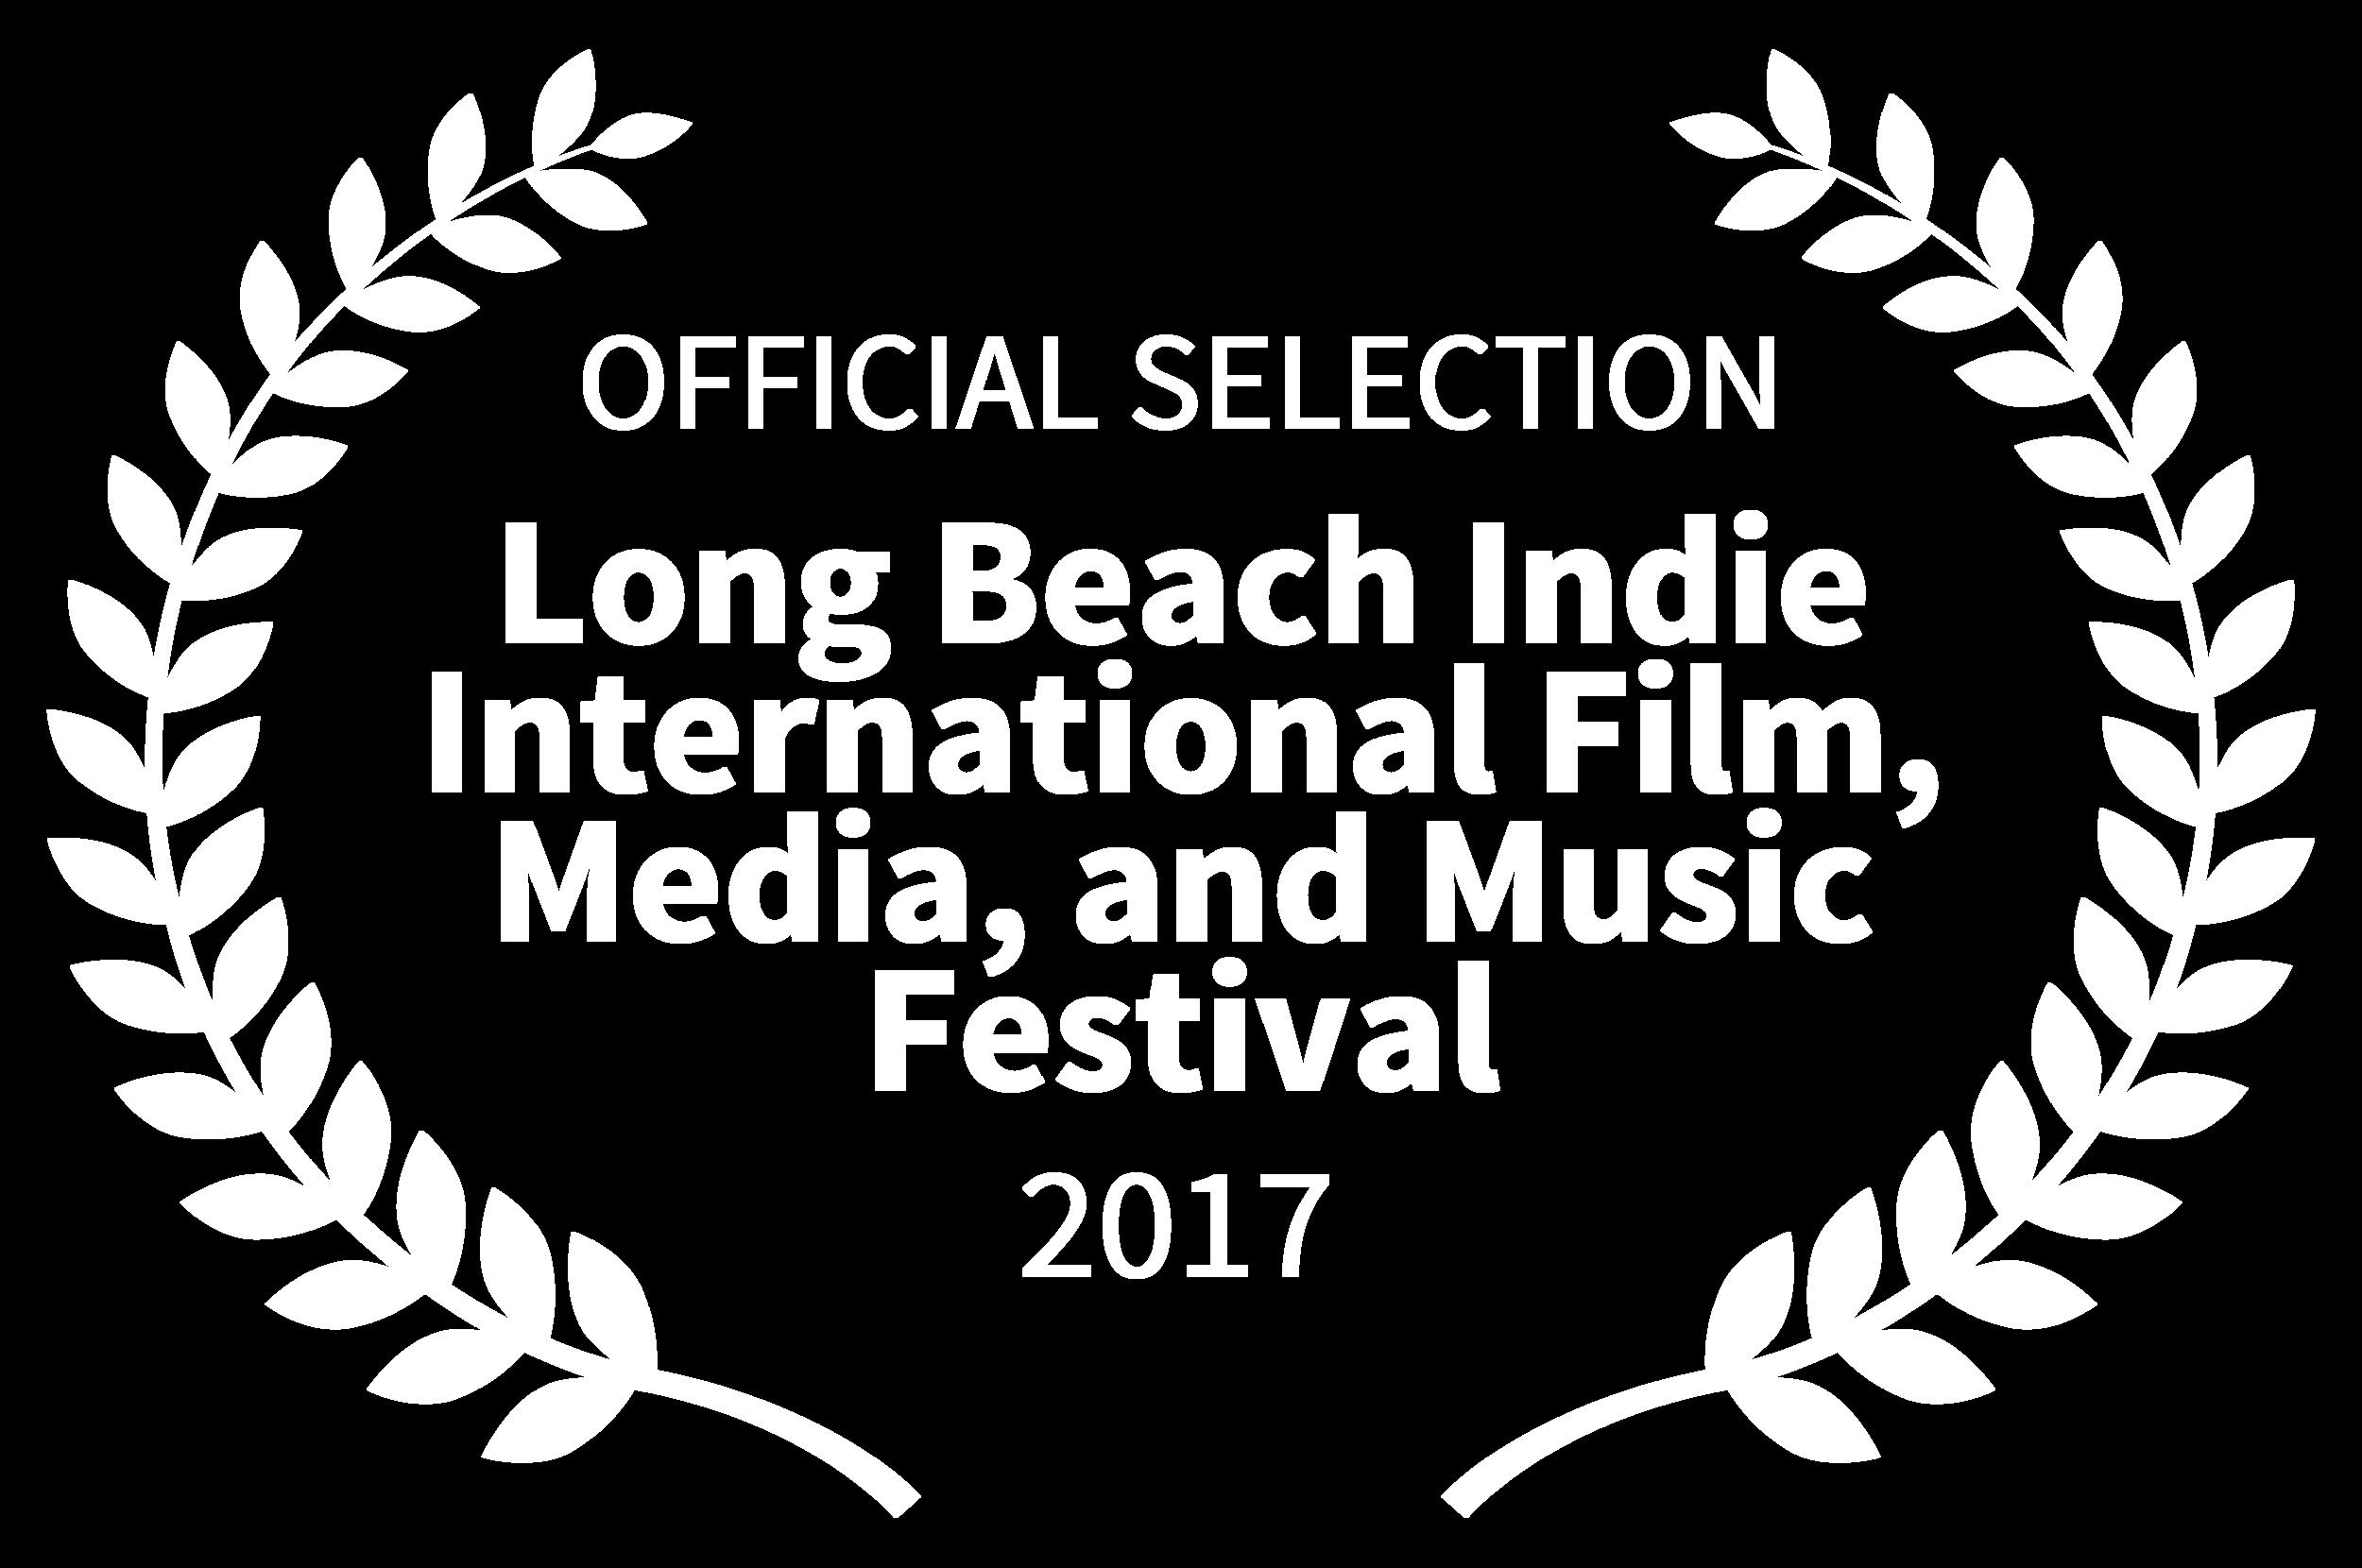 Laurels 2 OFFICIALSELECTION-LongBeachIndieInternationalFilmMediaandMusicFestival-2017 (1).png